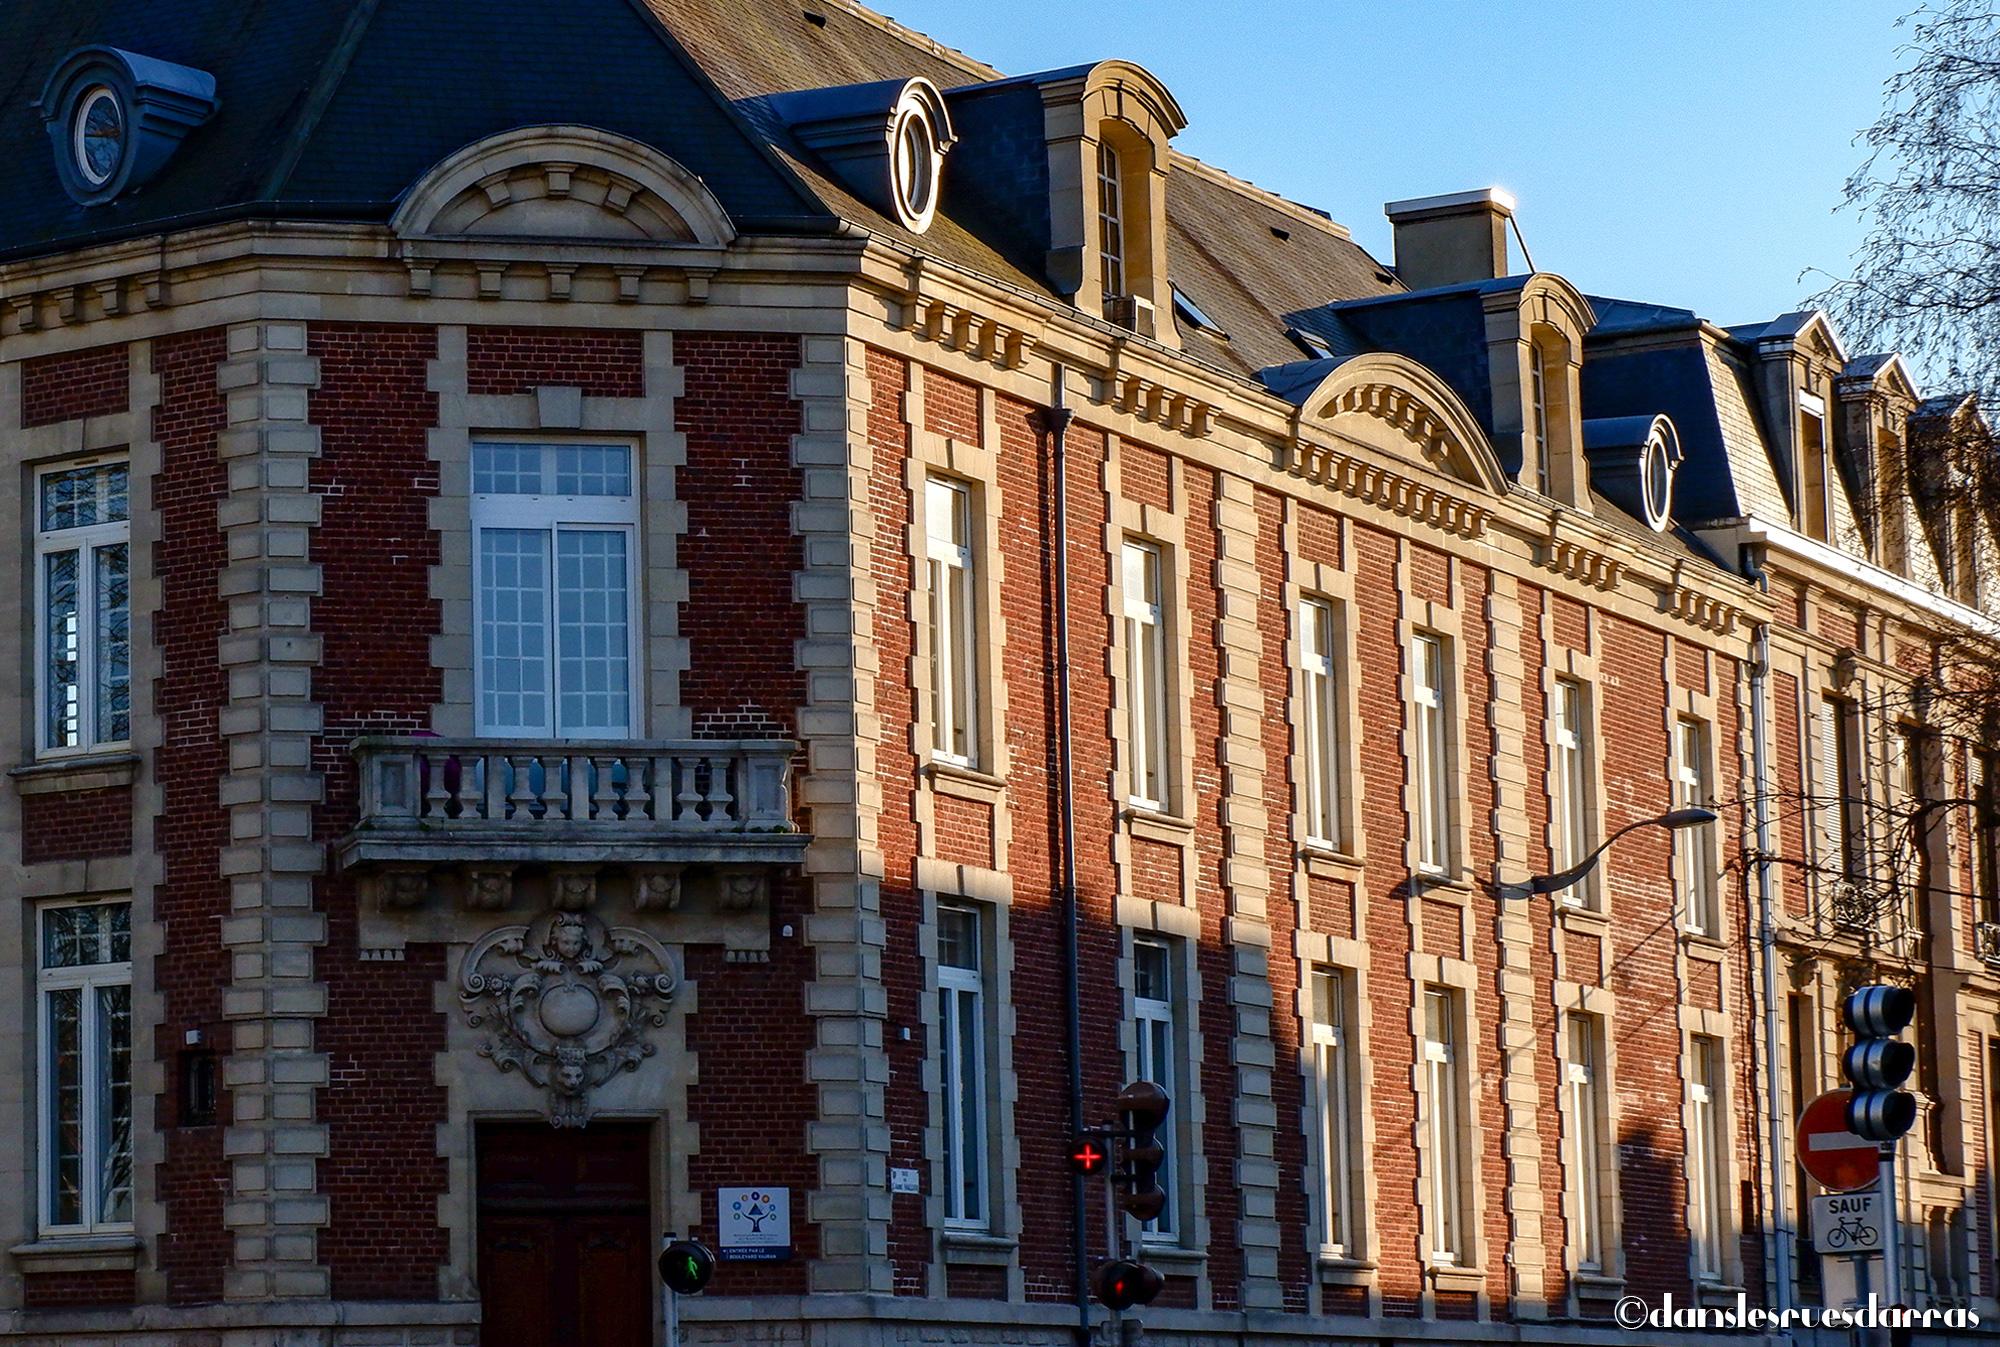 Hôtel de Couturaud - 1 rue de l'Abbé Halluin - Arras (©MD - danslesruesdarras)